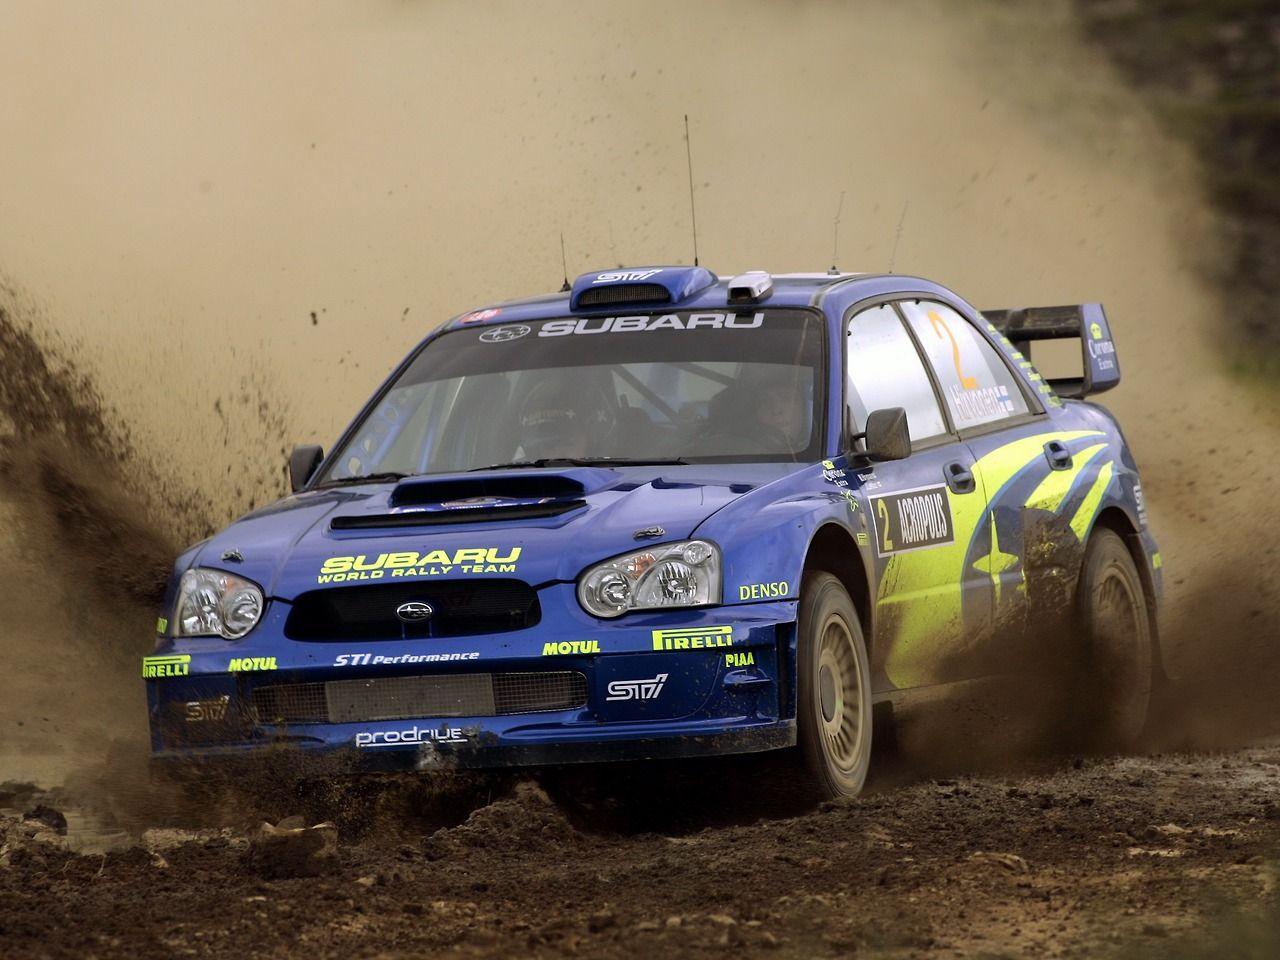 Subaru Impreza Wrc Rally Car Subaru Rally Subaru Impreza Wrc Subaru Wrc